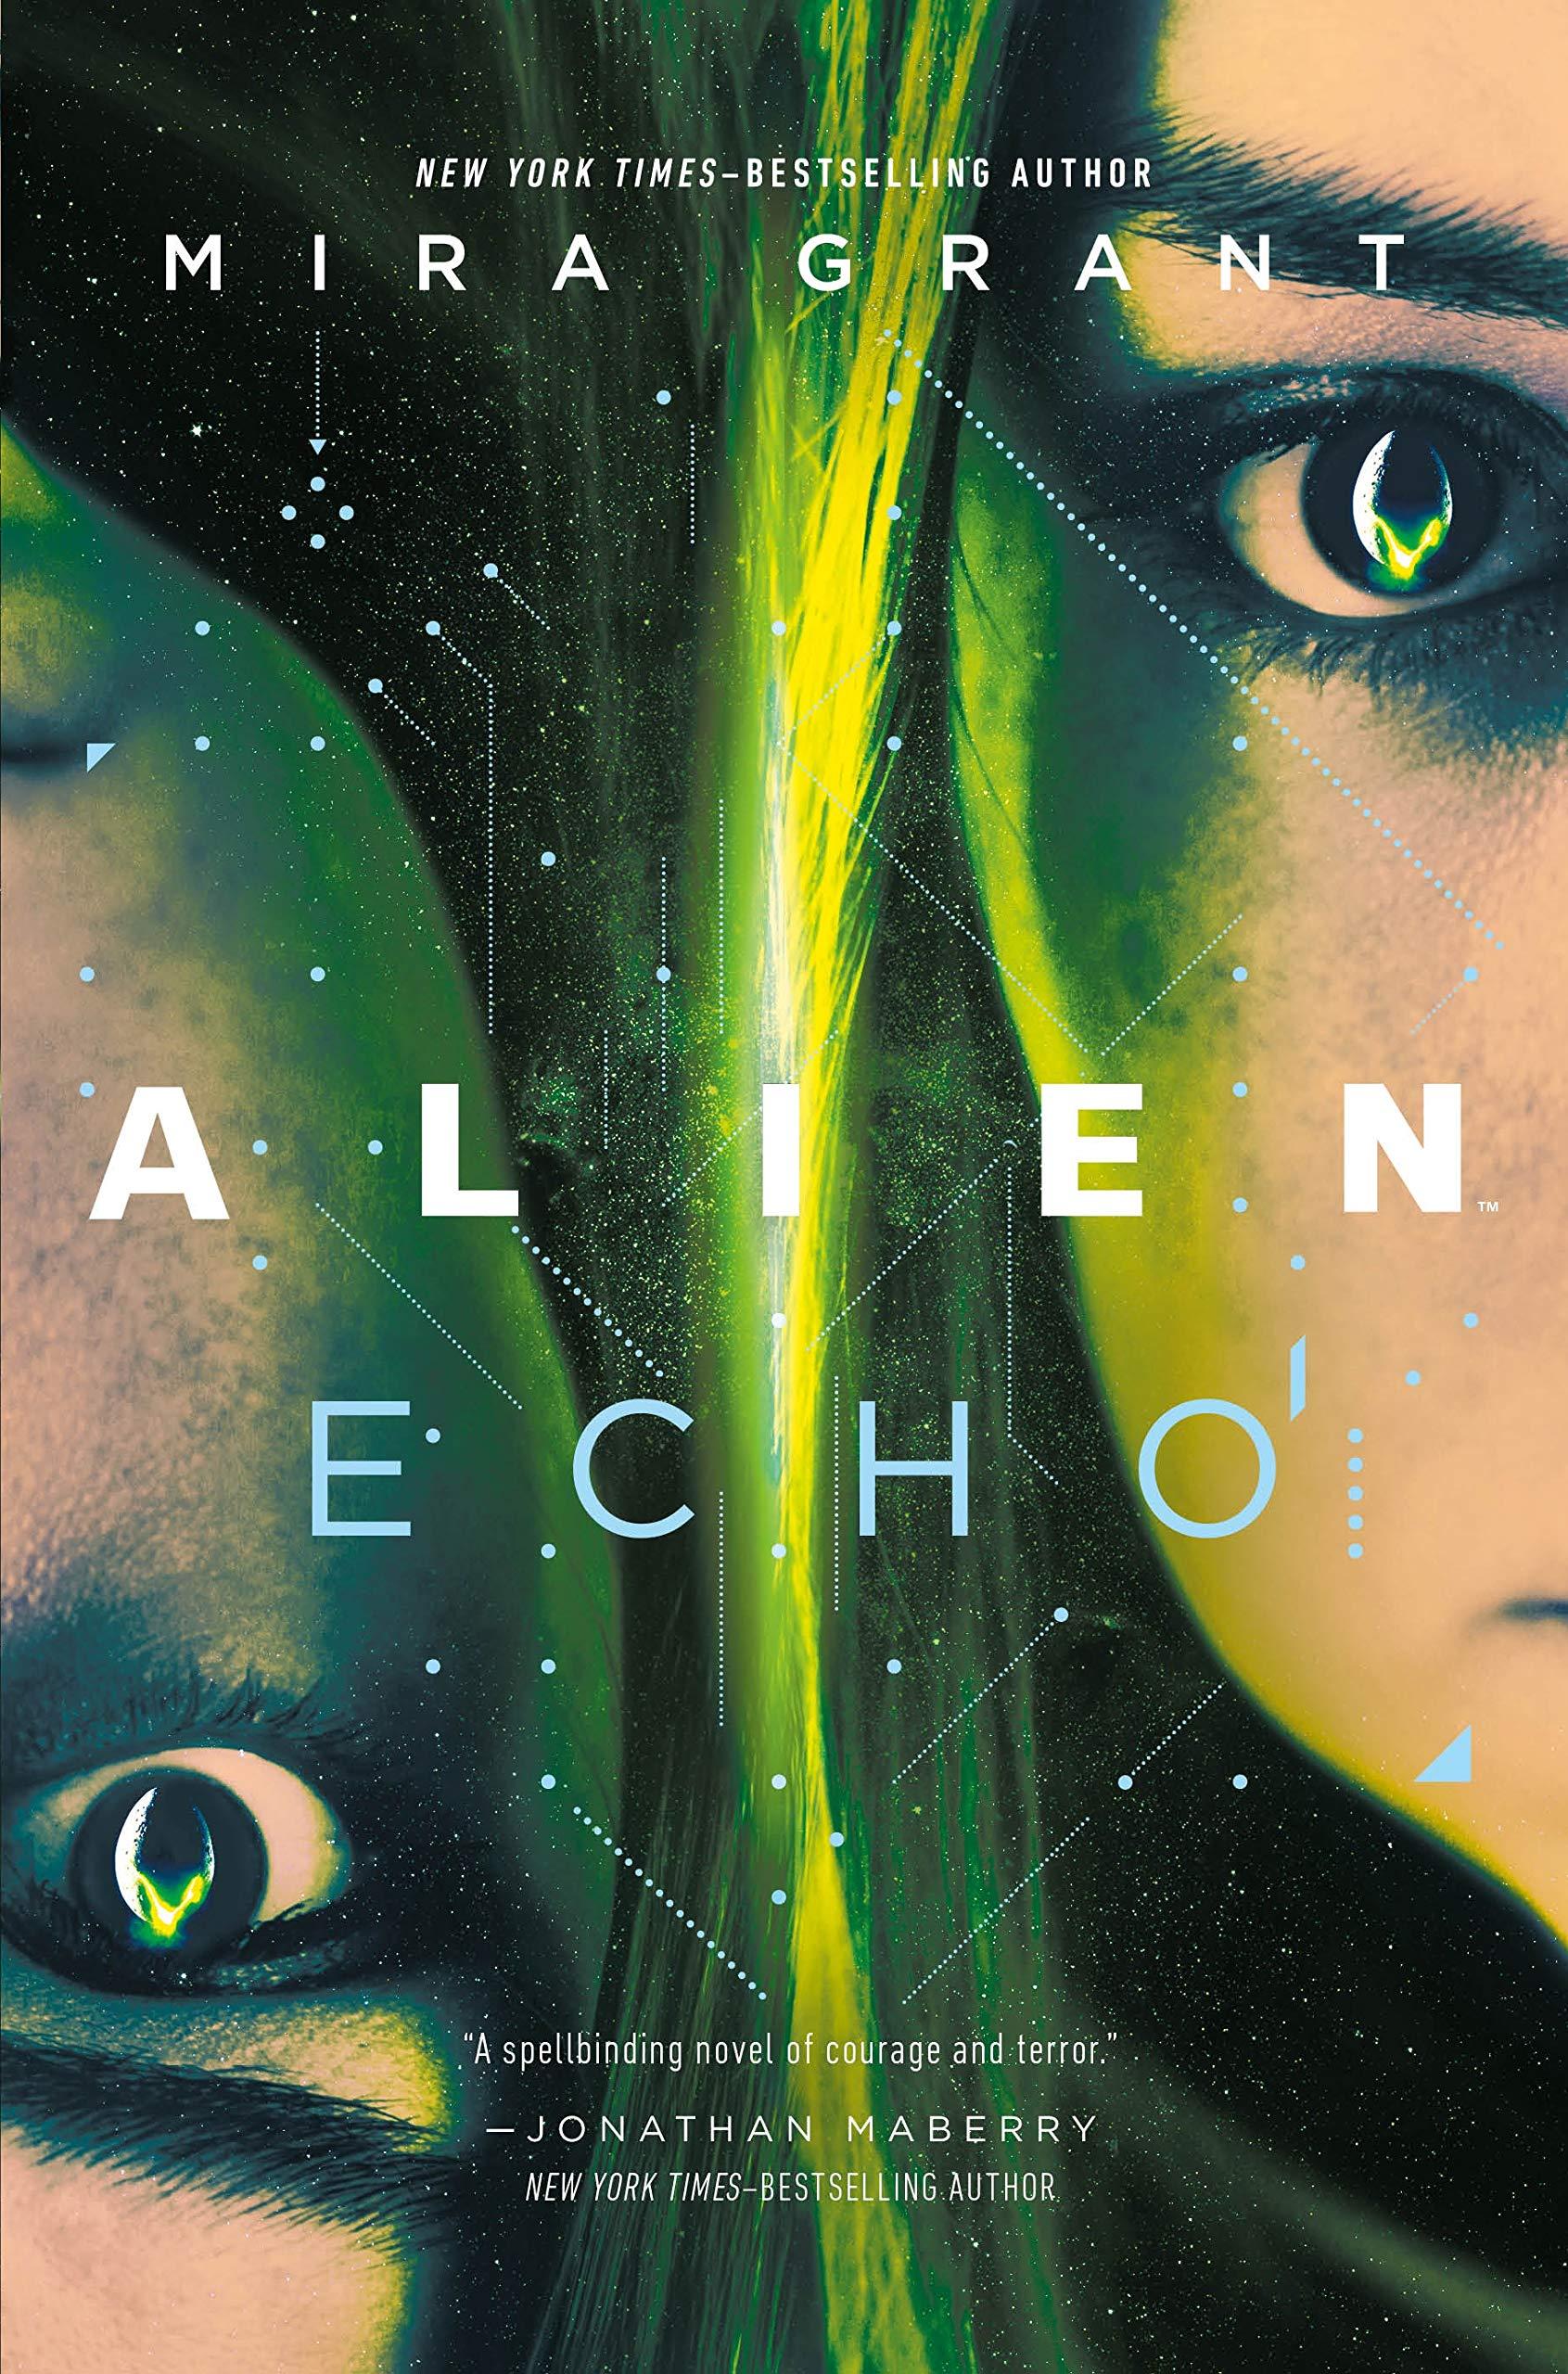 Amazon.com: Alien: Echo: An Original Young Adult Novel of the Alien  Universe (9781250306296): Grant, Mira: Books